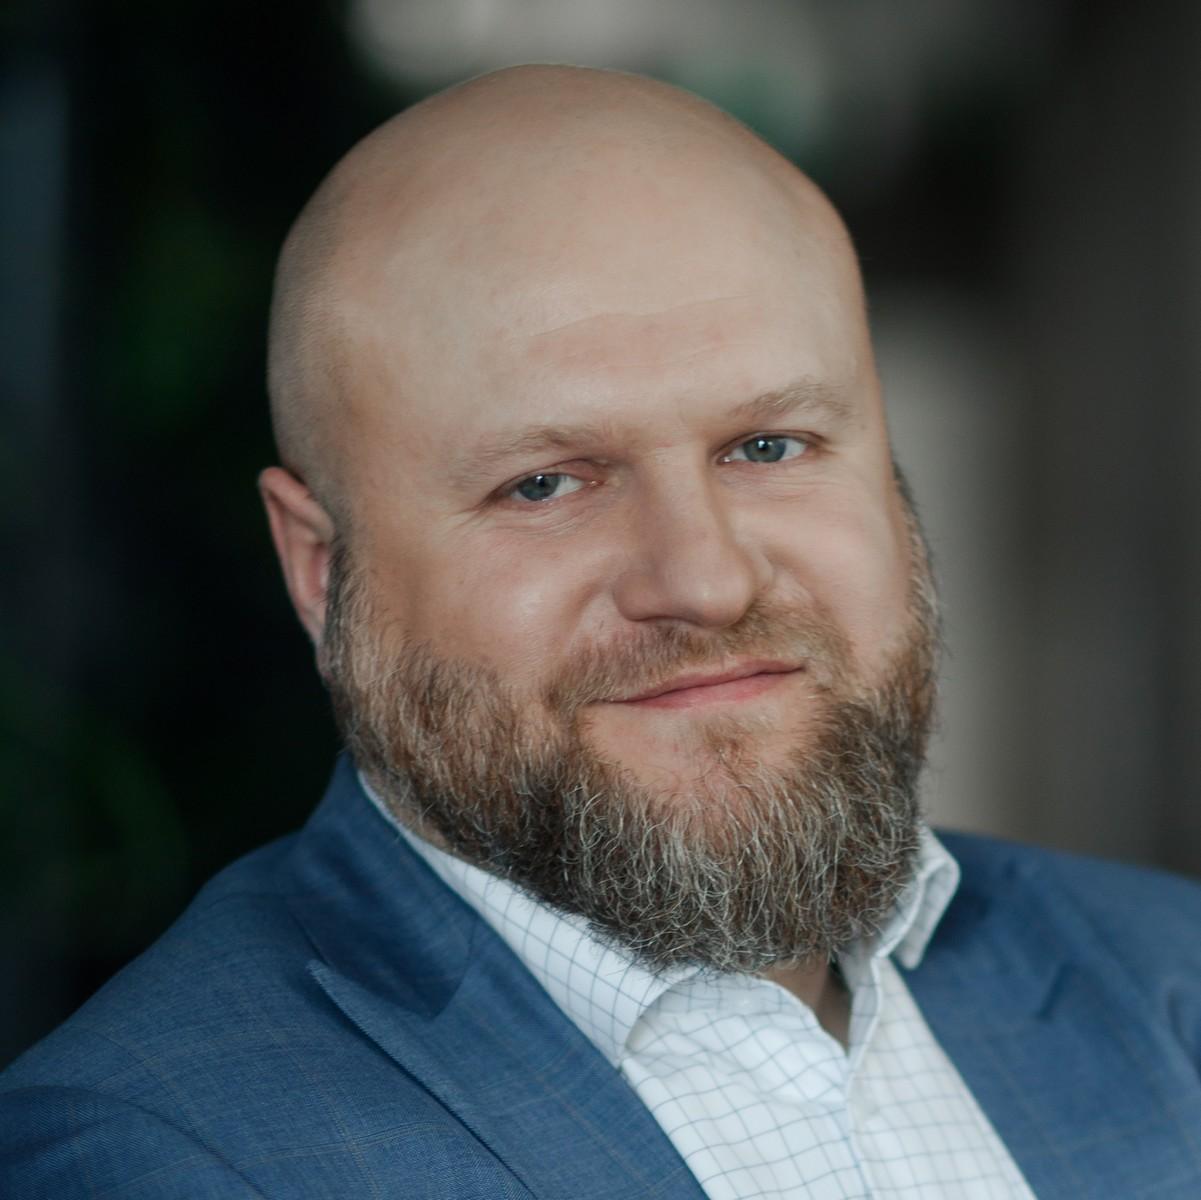 Пëтр Зубрицкий